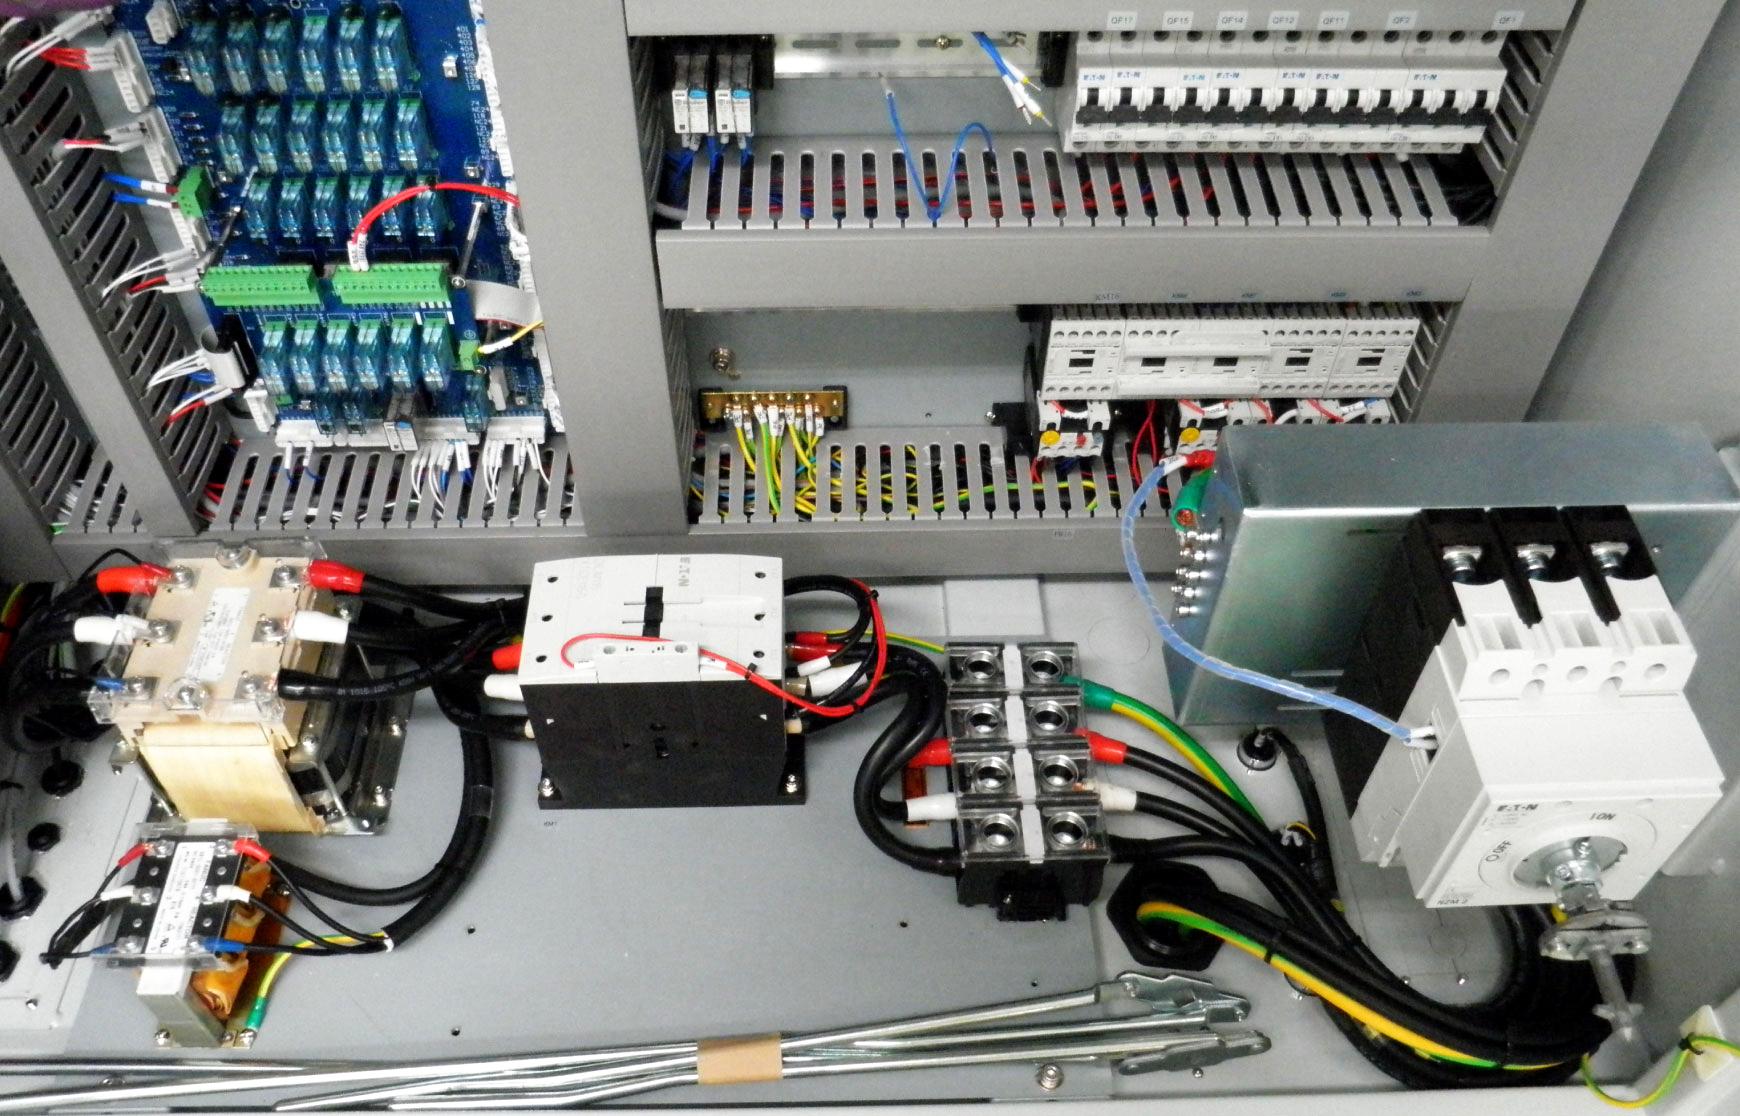 CNC Machine Control Cabinet fabrication and assembly - Yeu-Lian Elec.Manual Pulse Generator, CNC Control Panel - Yeu-Lian Electronics